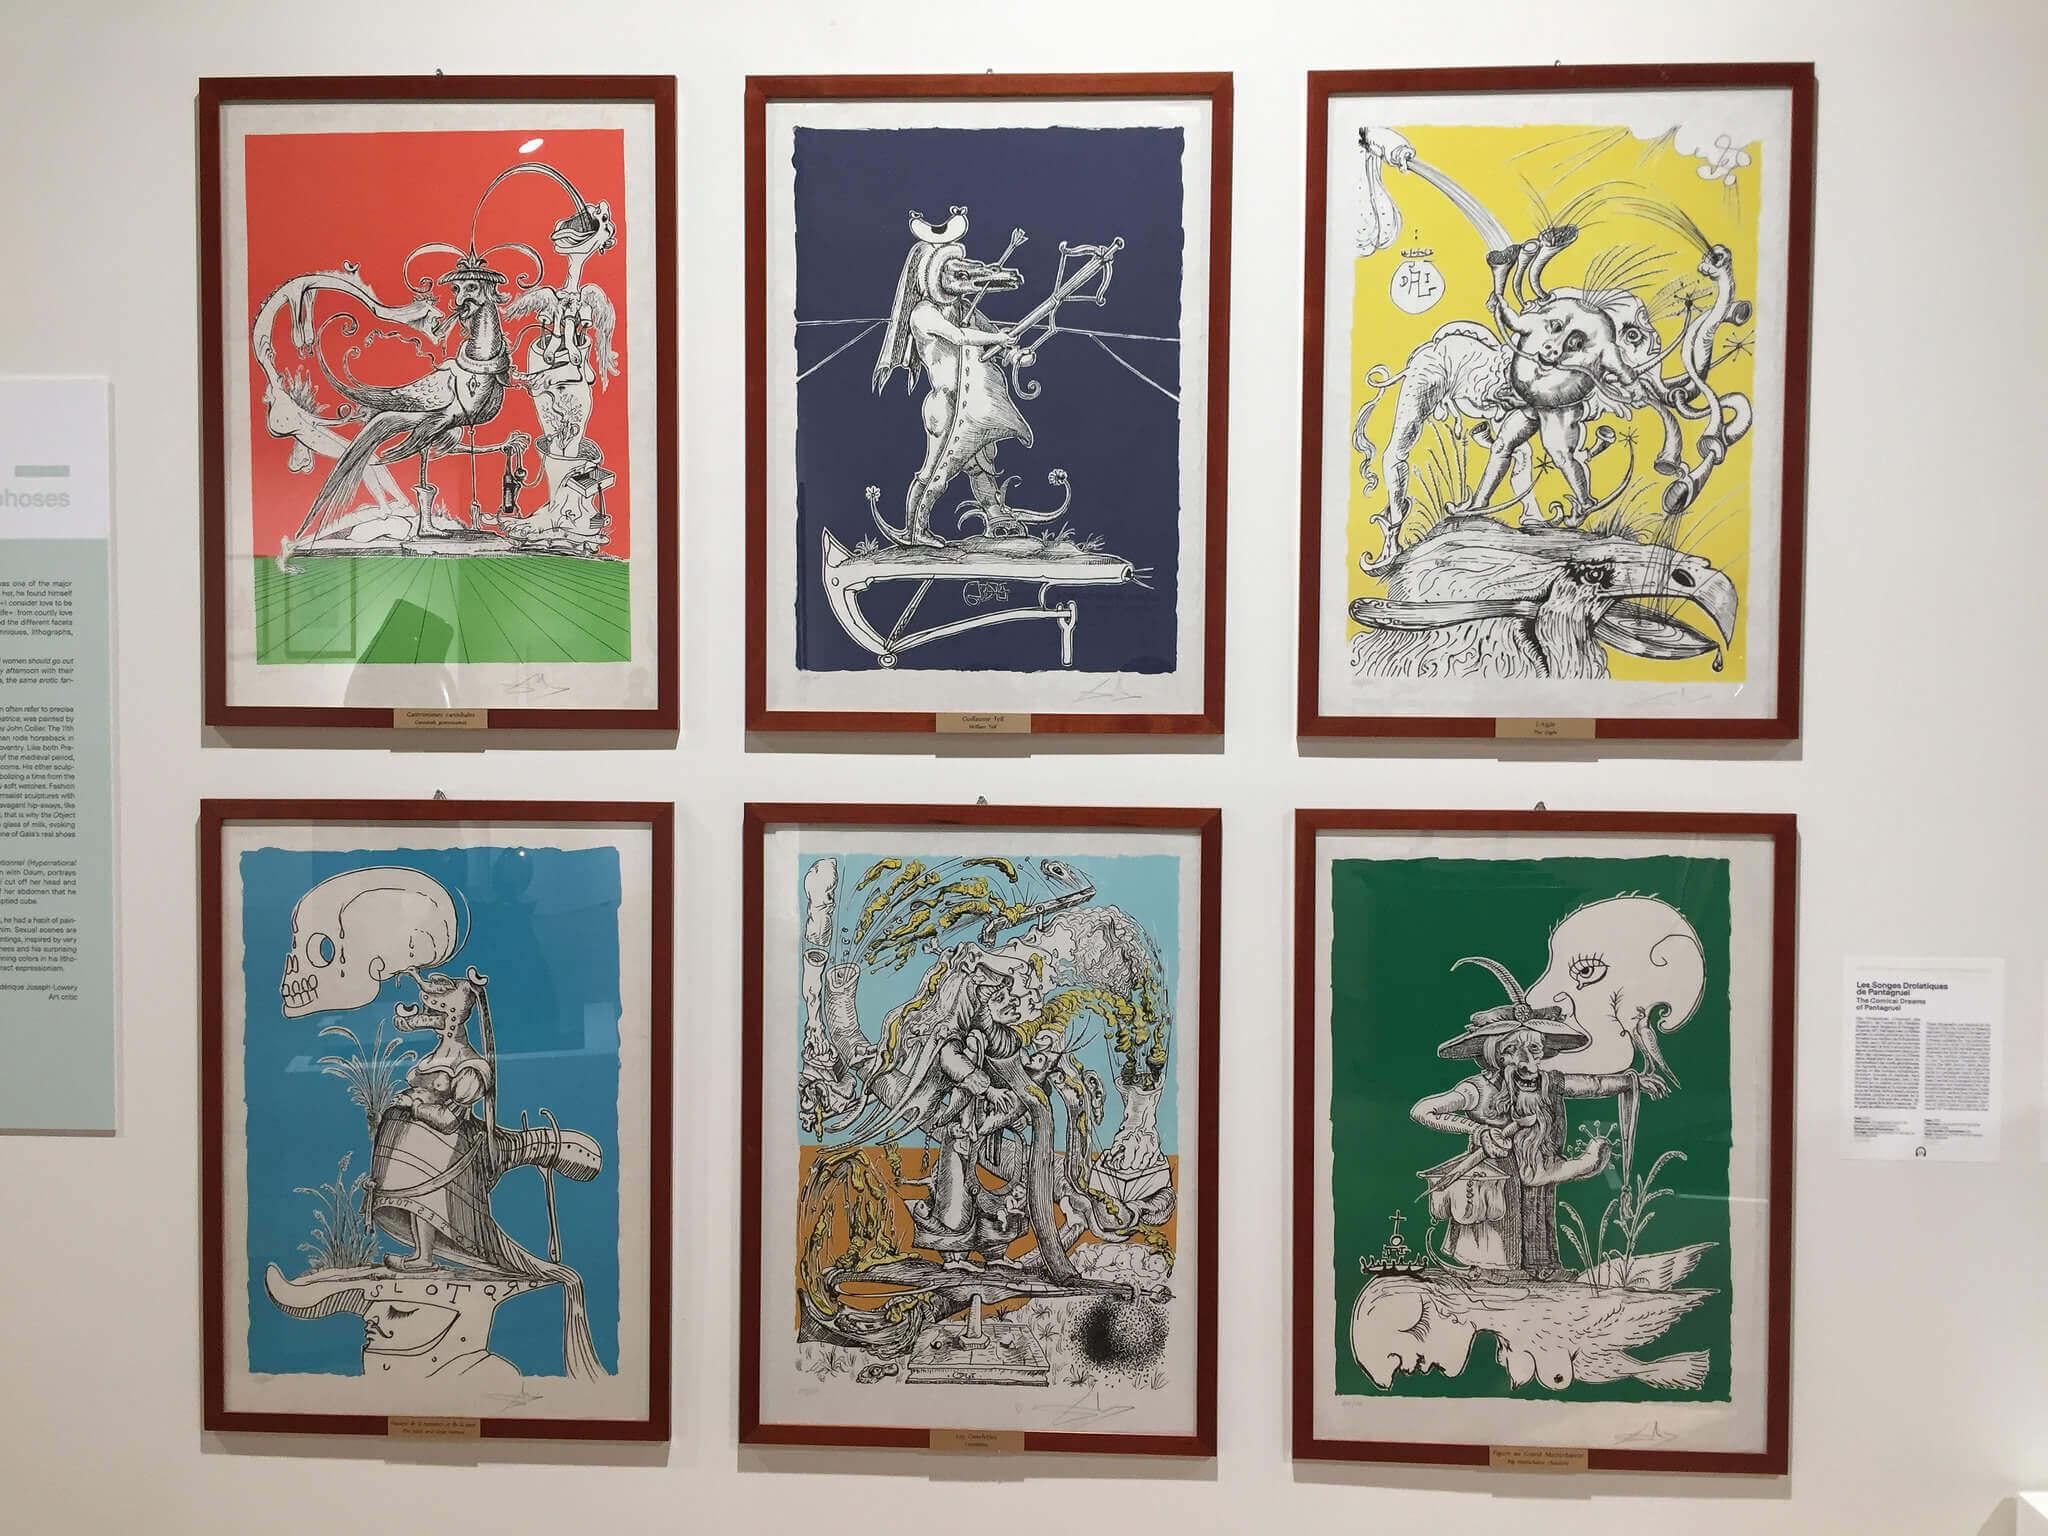 Salvador Dali Exhibit Paris